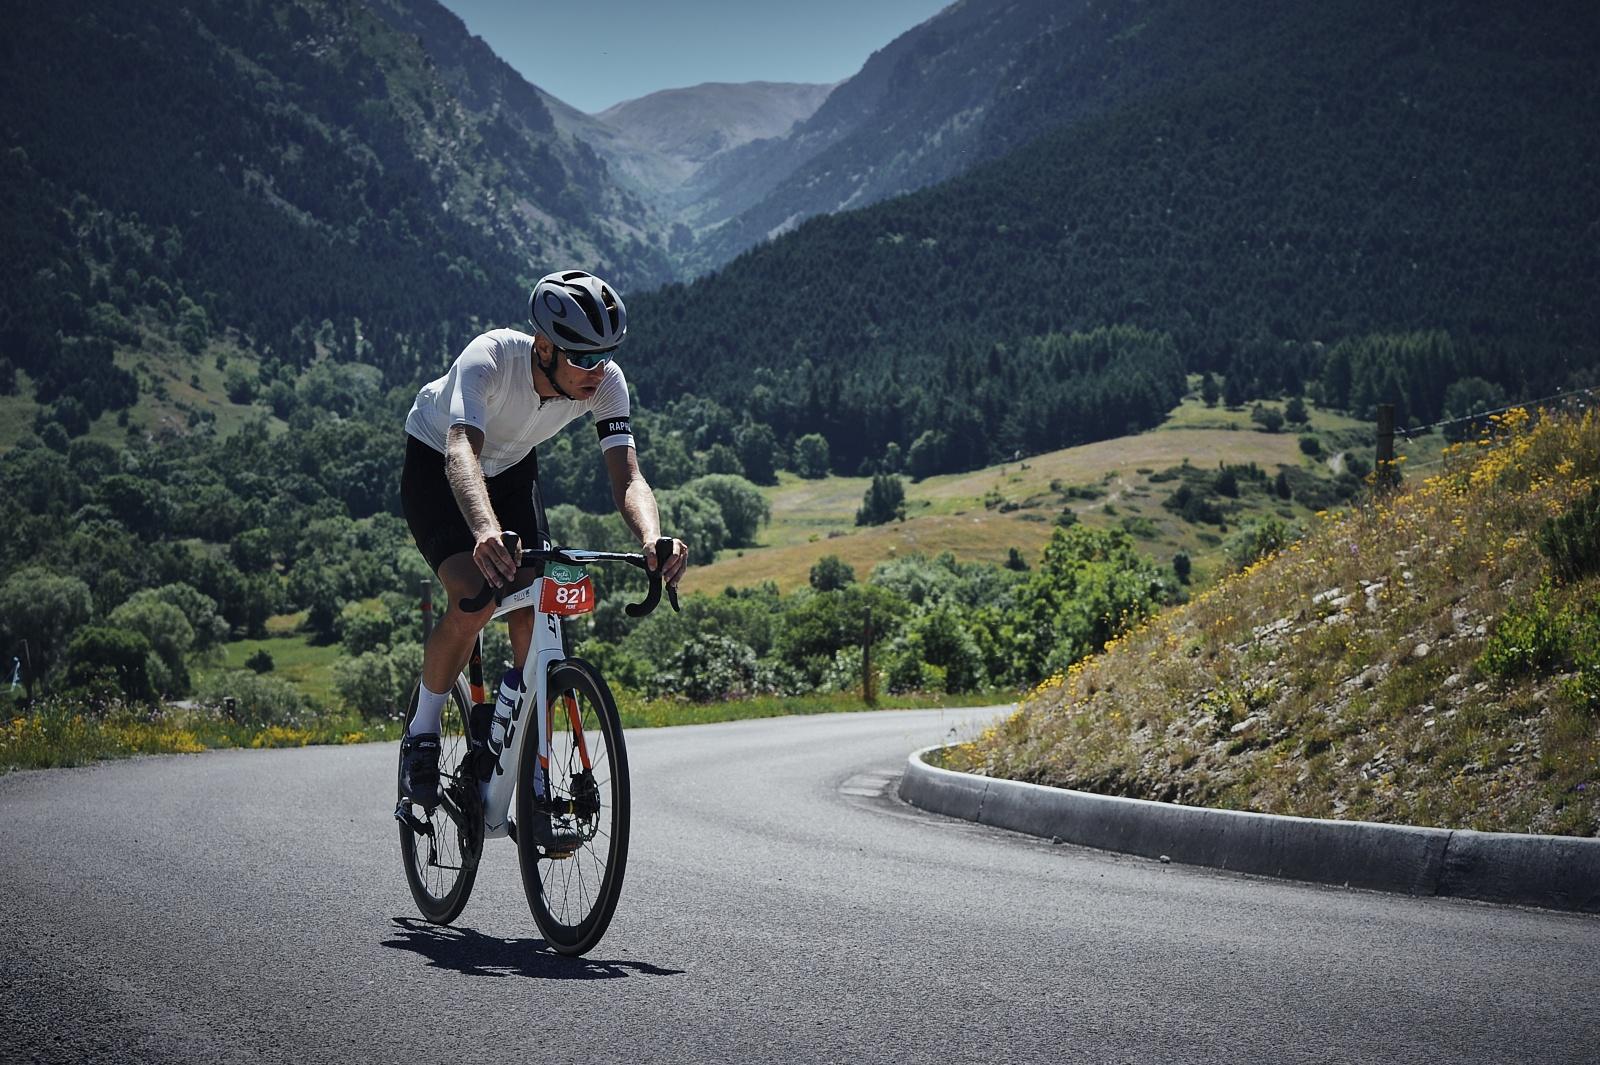 Alp-Cerdanya Cicle Tour 2020 - QuieroMisFotos.com - Sergio Tomico, Photography